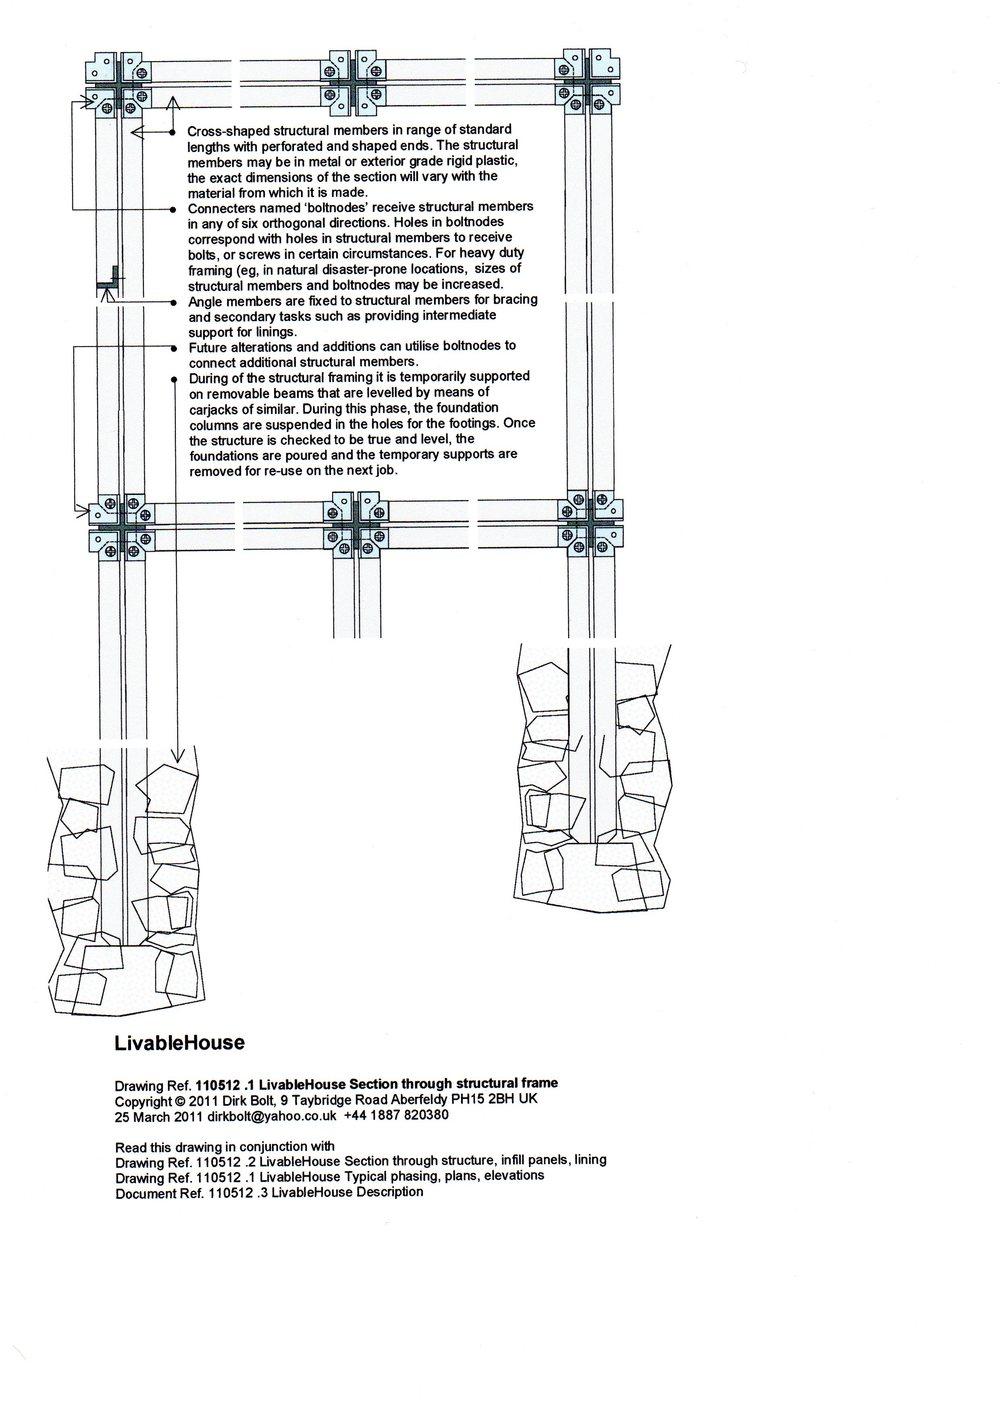 110525 1 livablehouse section through structural frame image 1 bigger